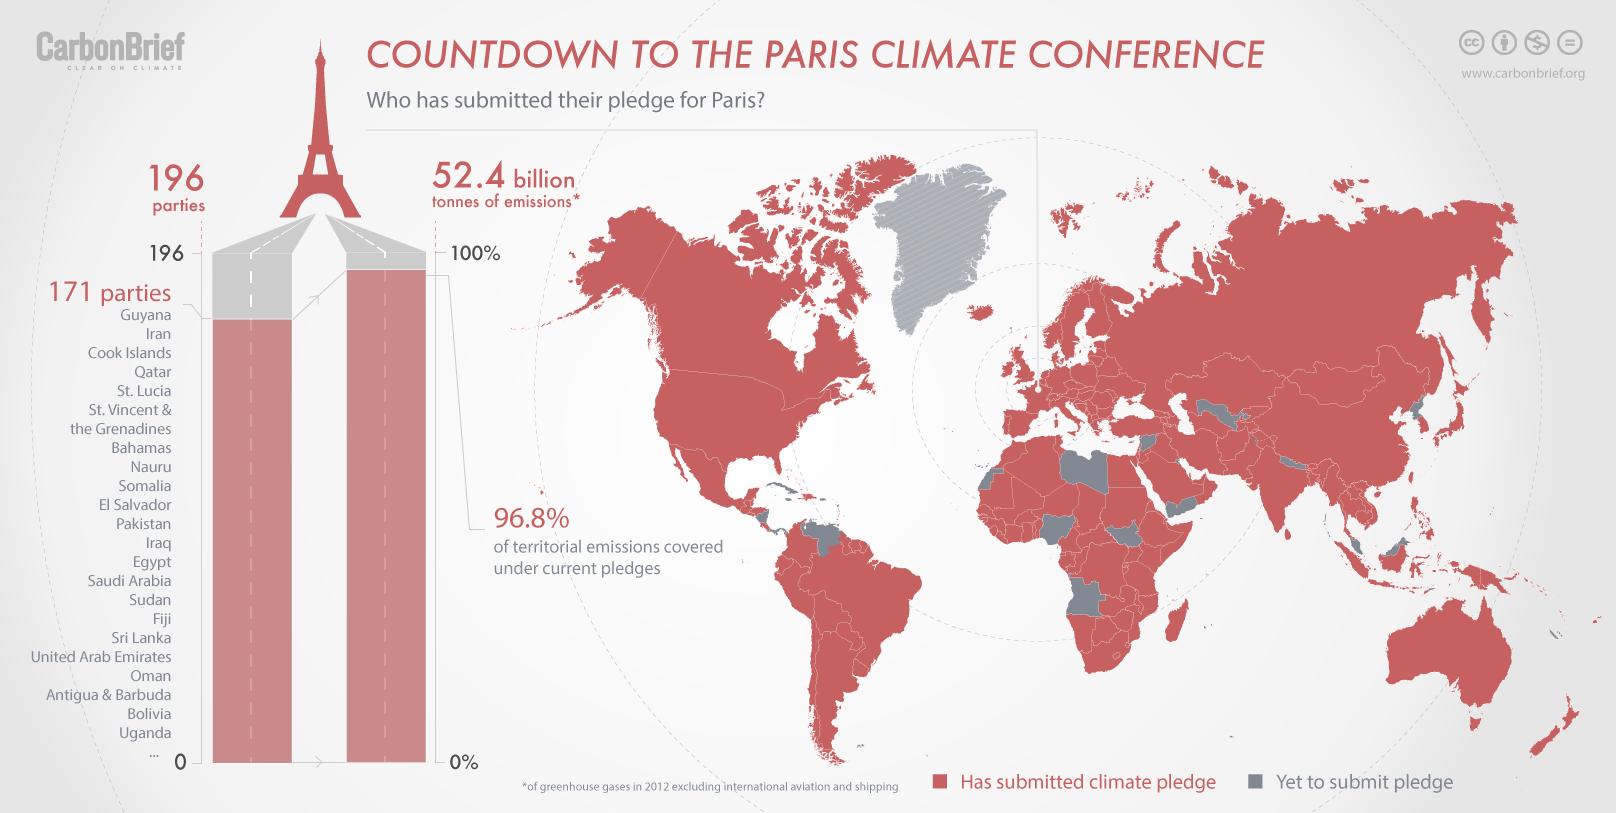 CarbonBrief Infographic